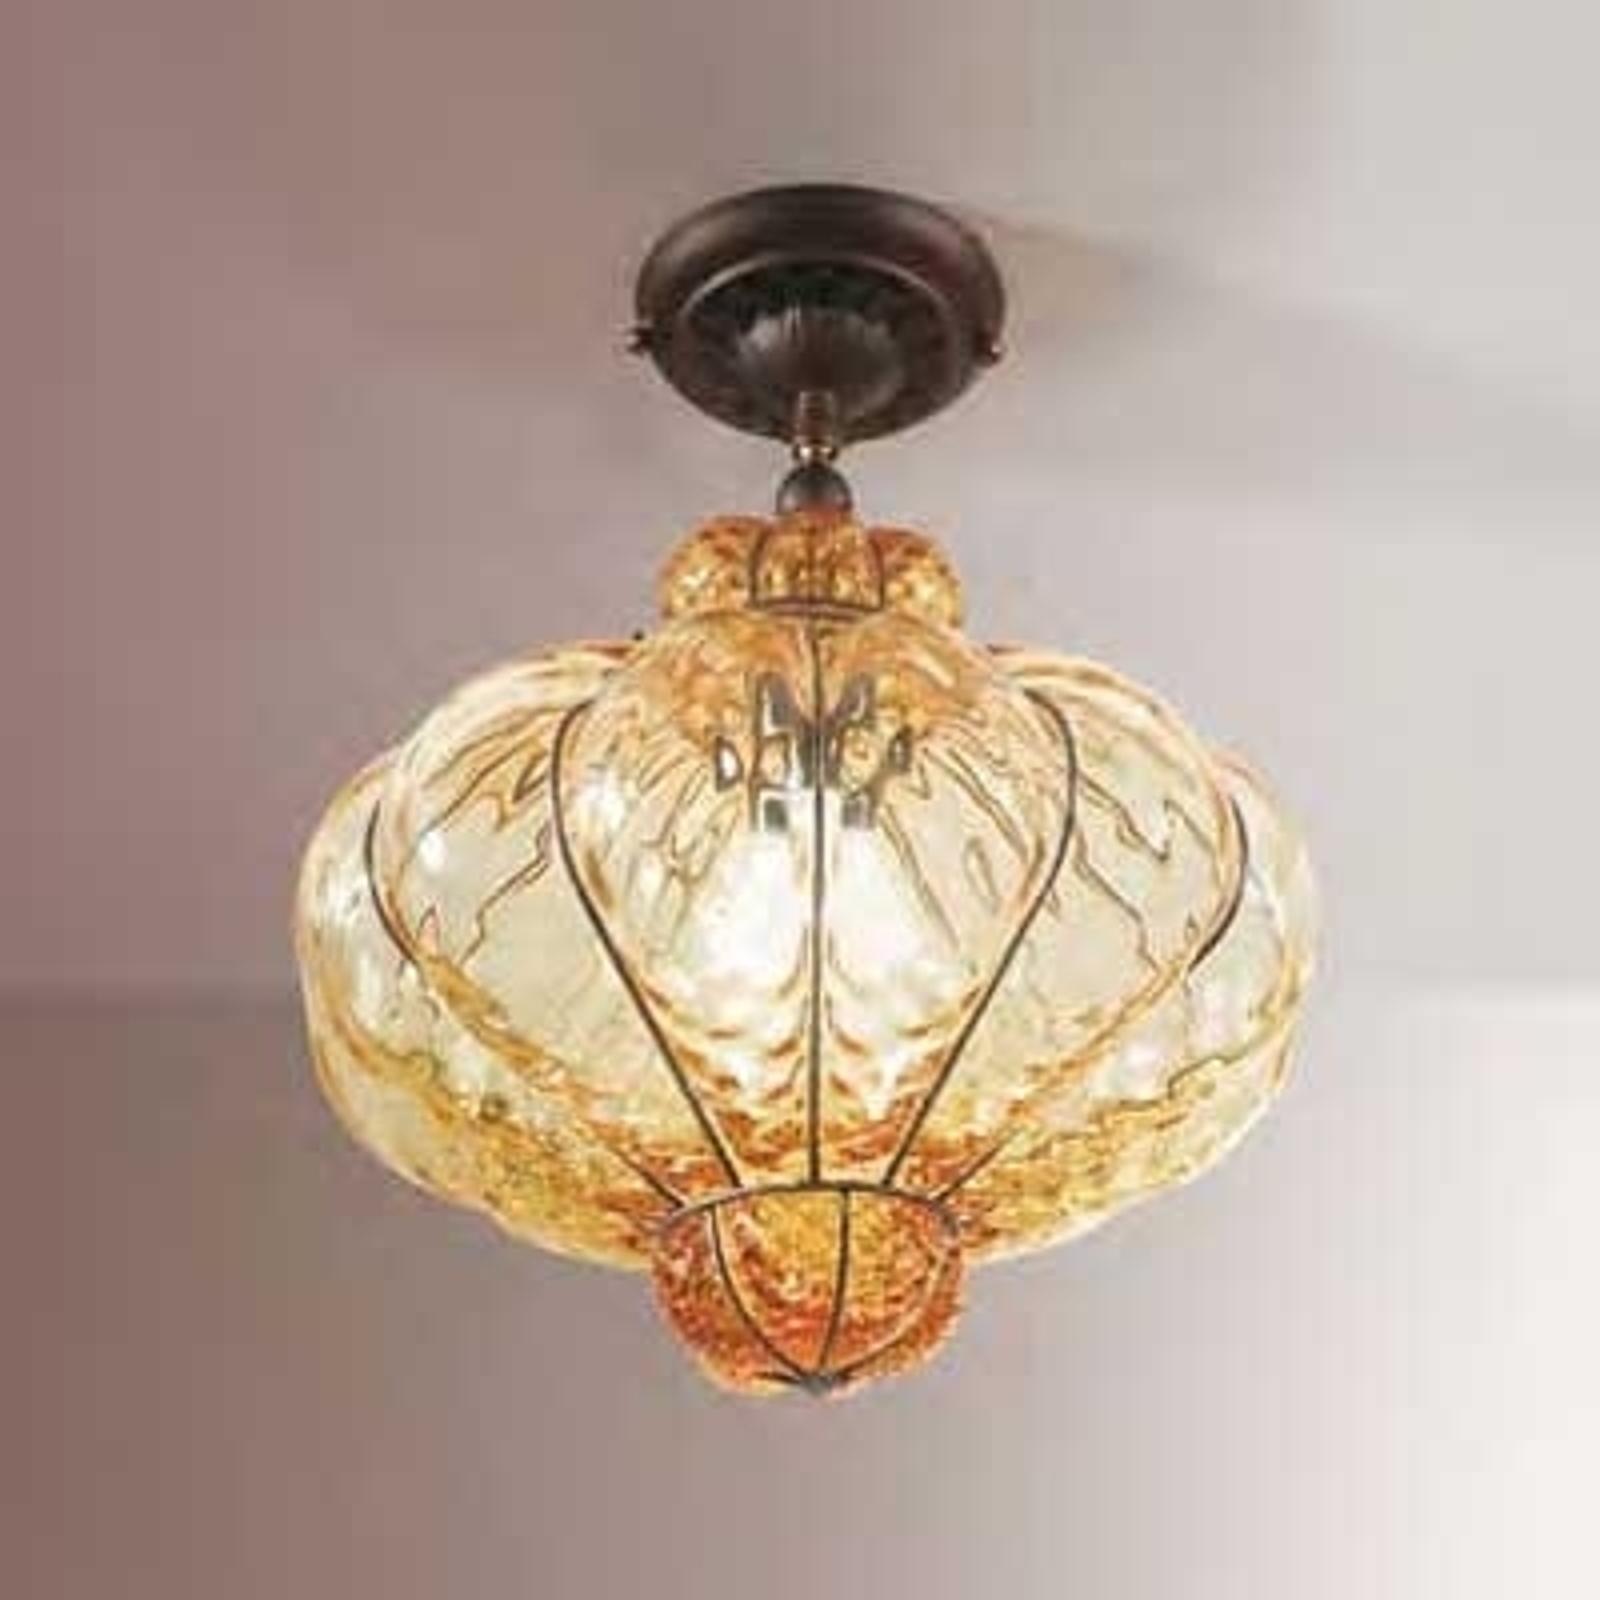 Muranoglass-taklampe SULTANO, 37 cm